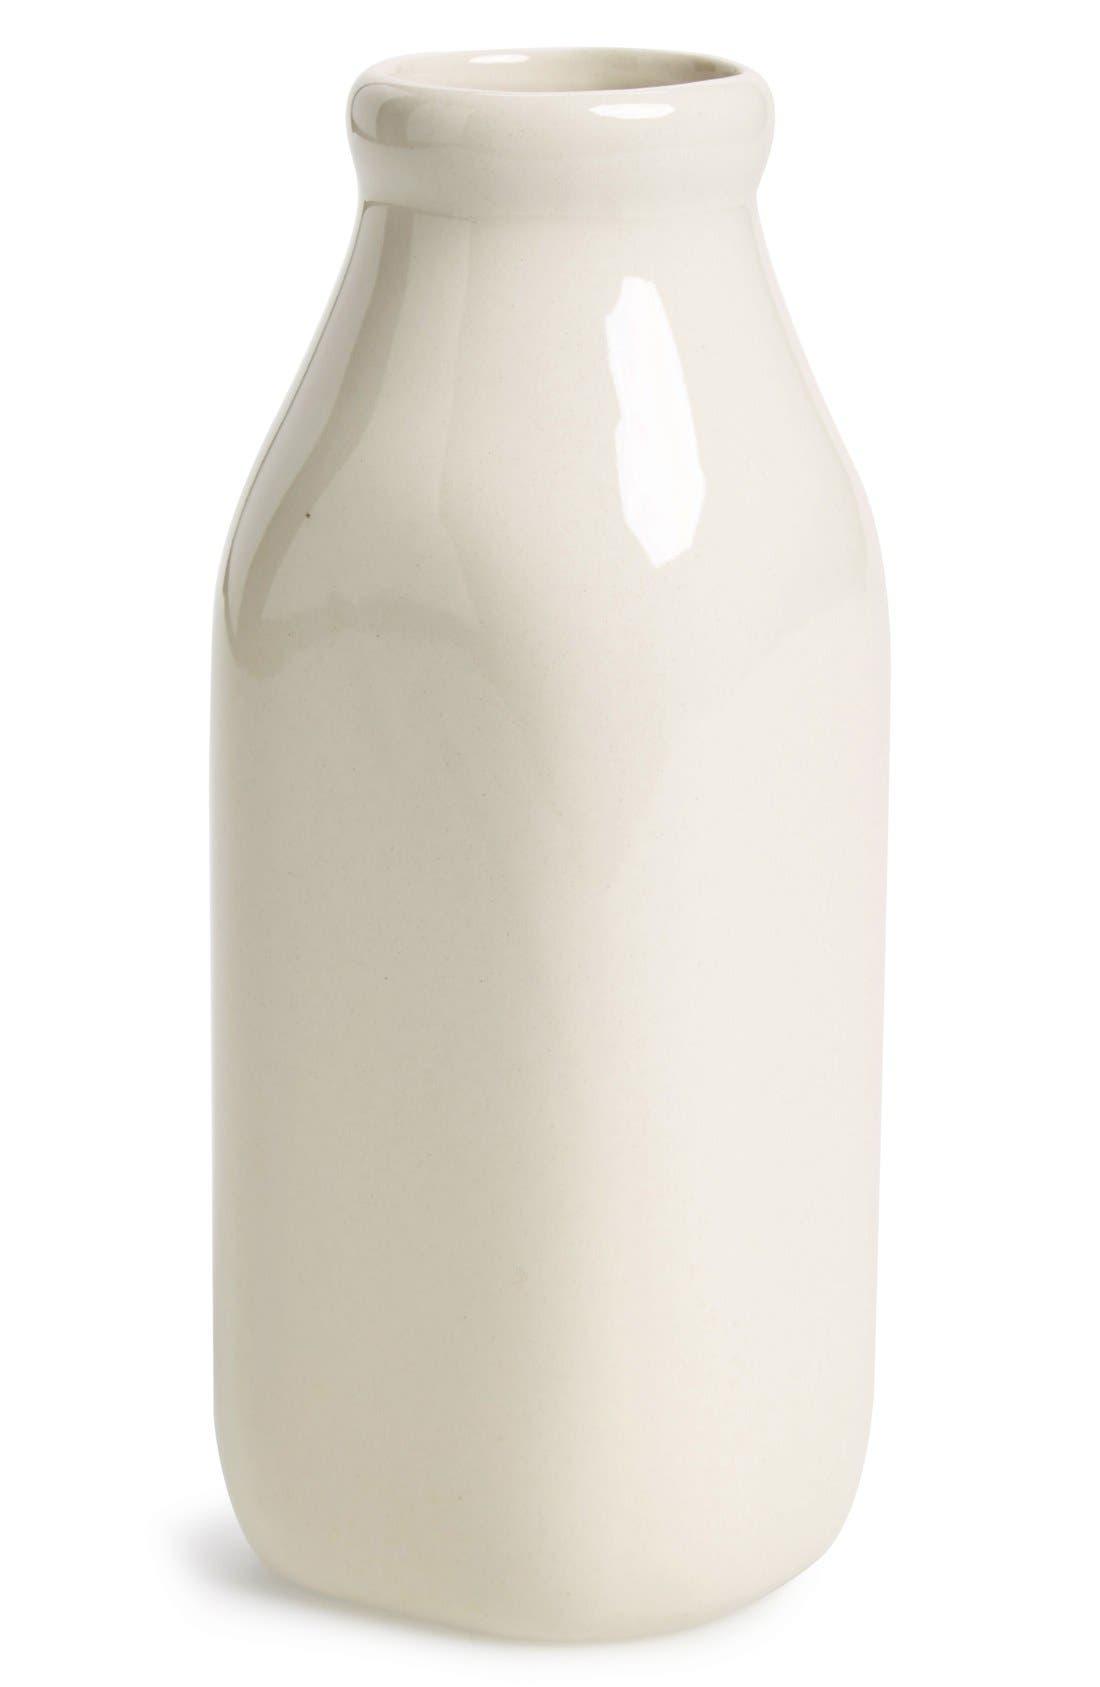 Main Image - Fishs Eddy Ceramic Milk Bottle